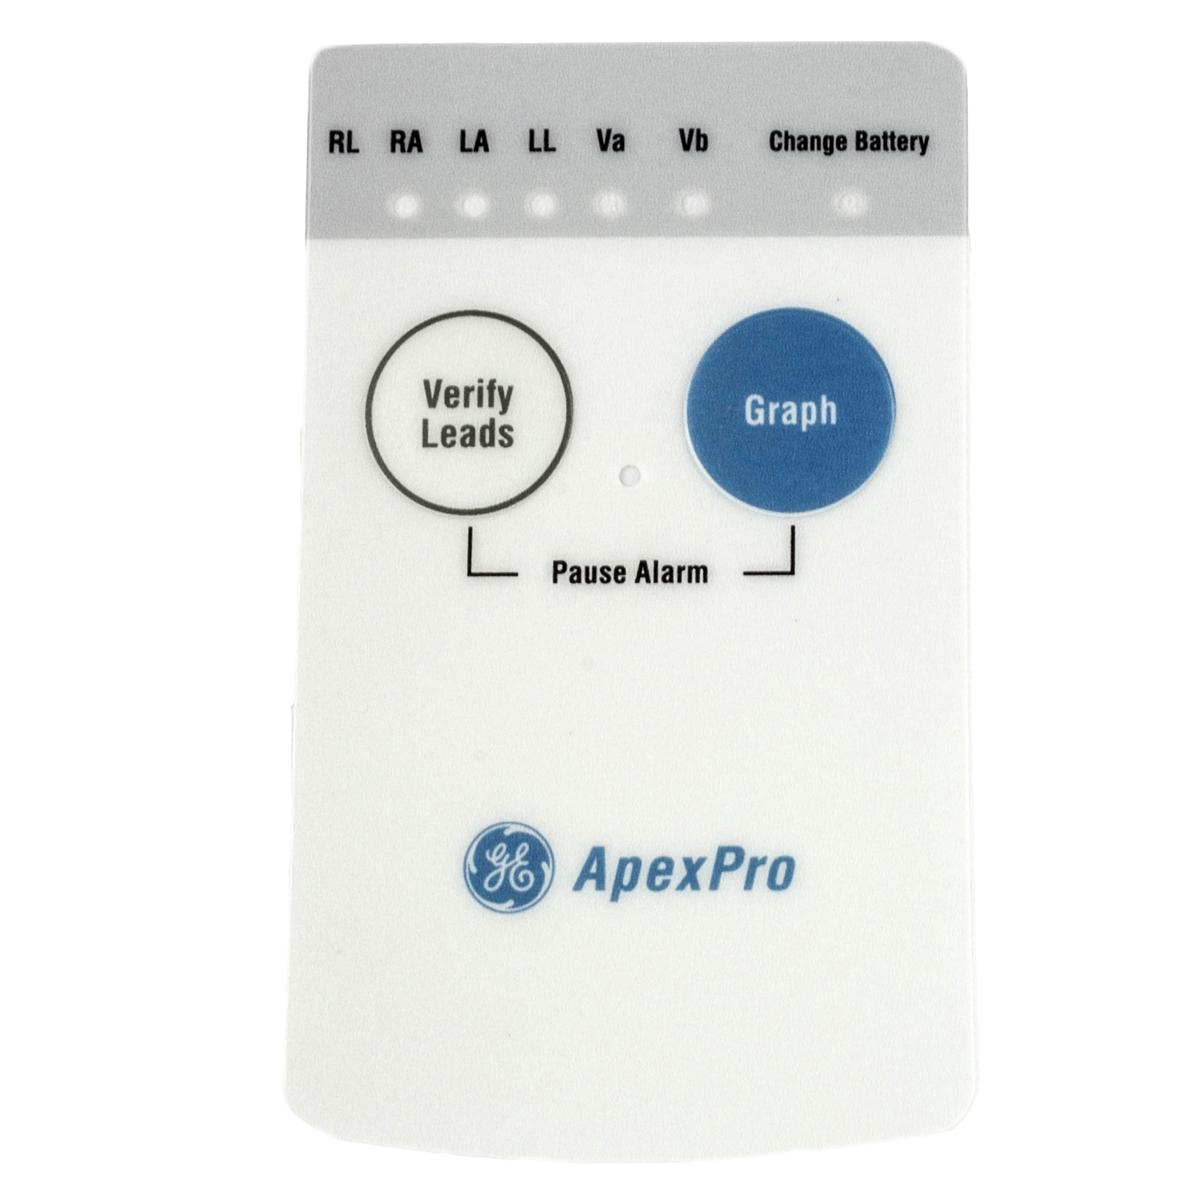 GE ApexPro Telemetry Transmitter Front Overlay Label